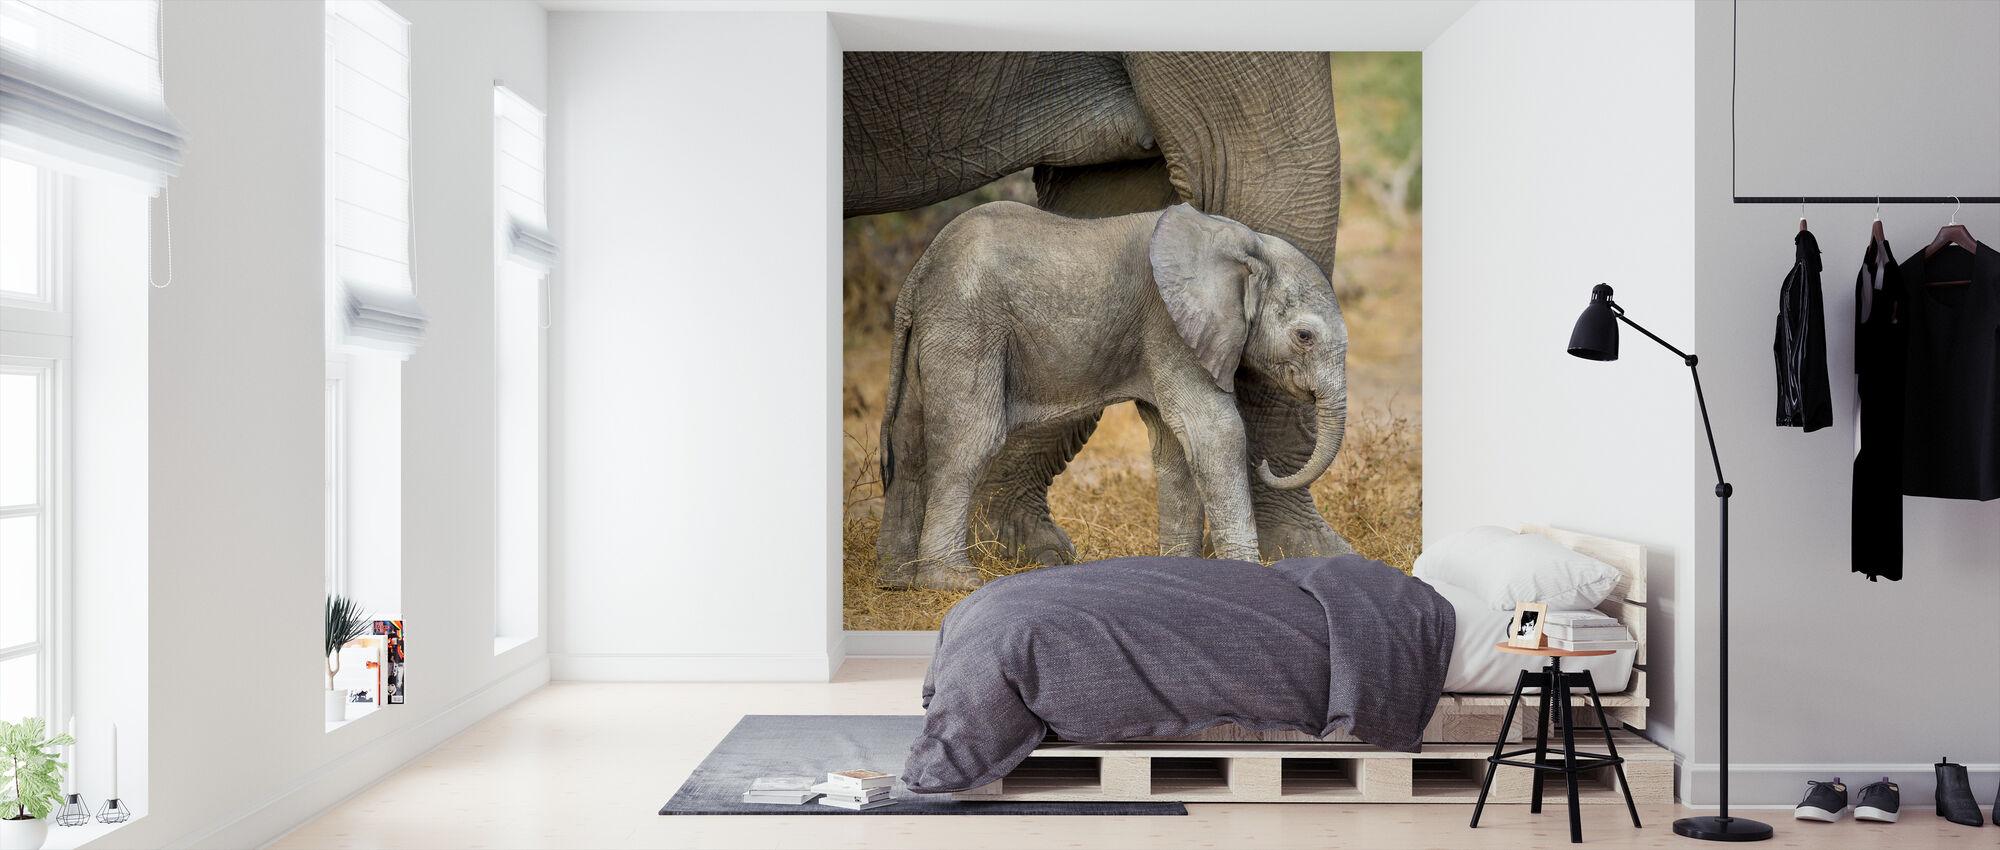 African Elephant Calf Next to Mother - Wallpaper - Bedroom